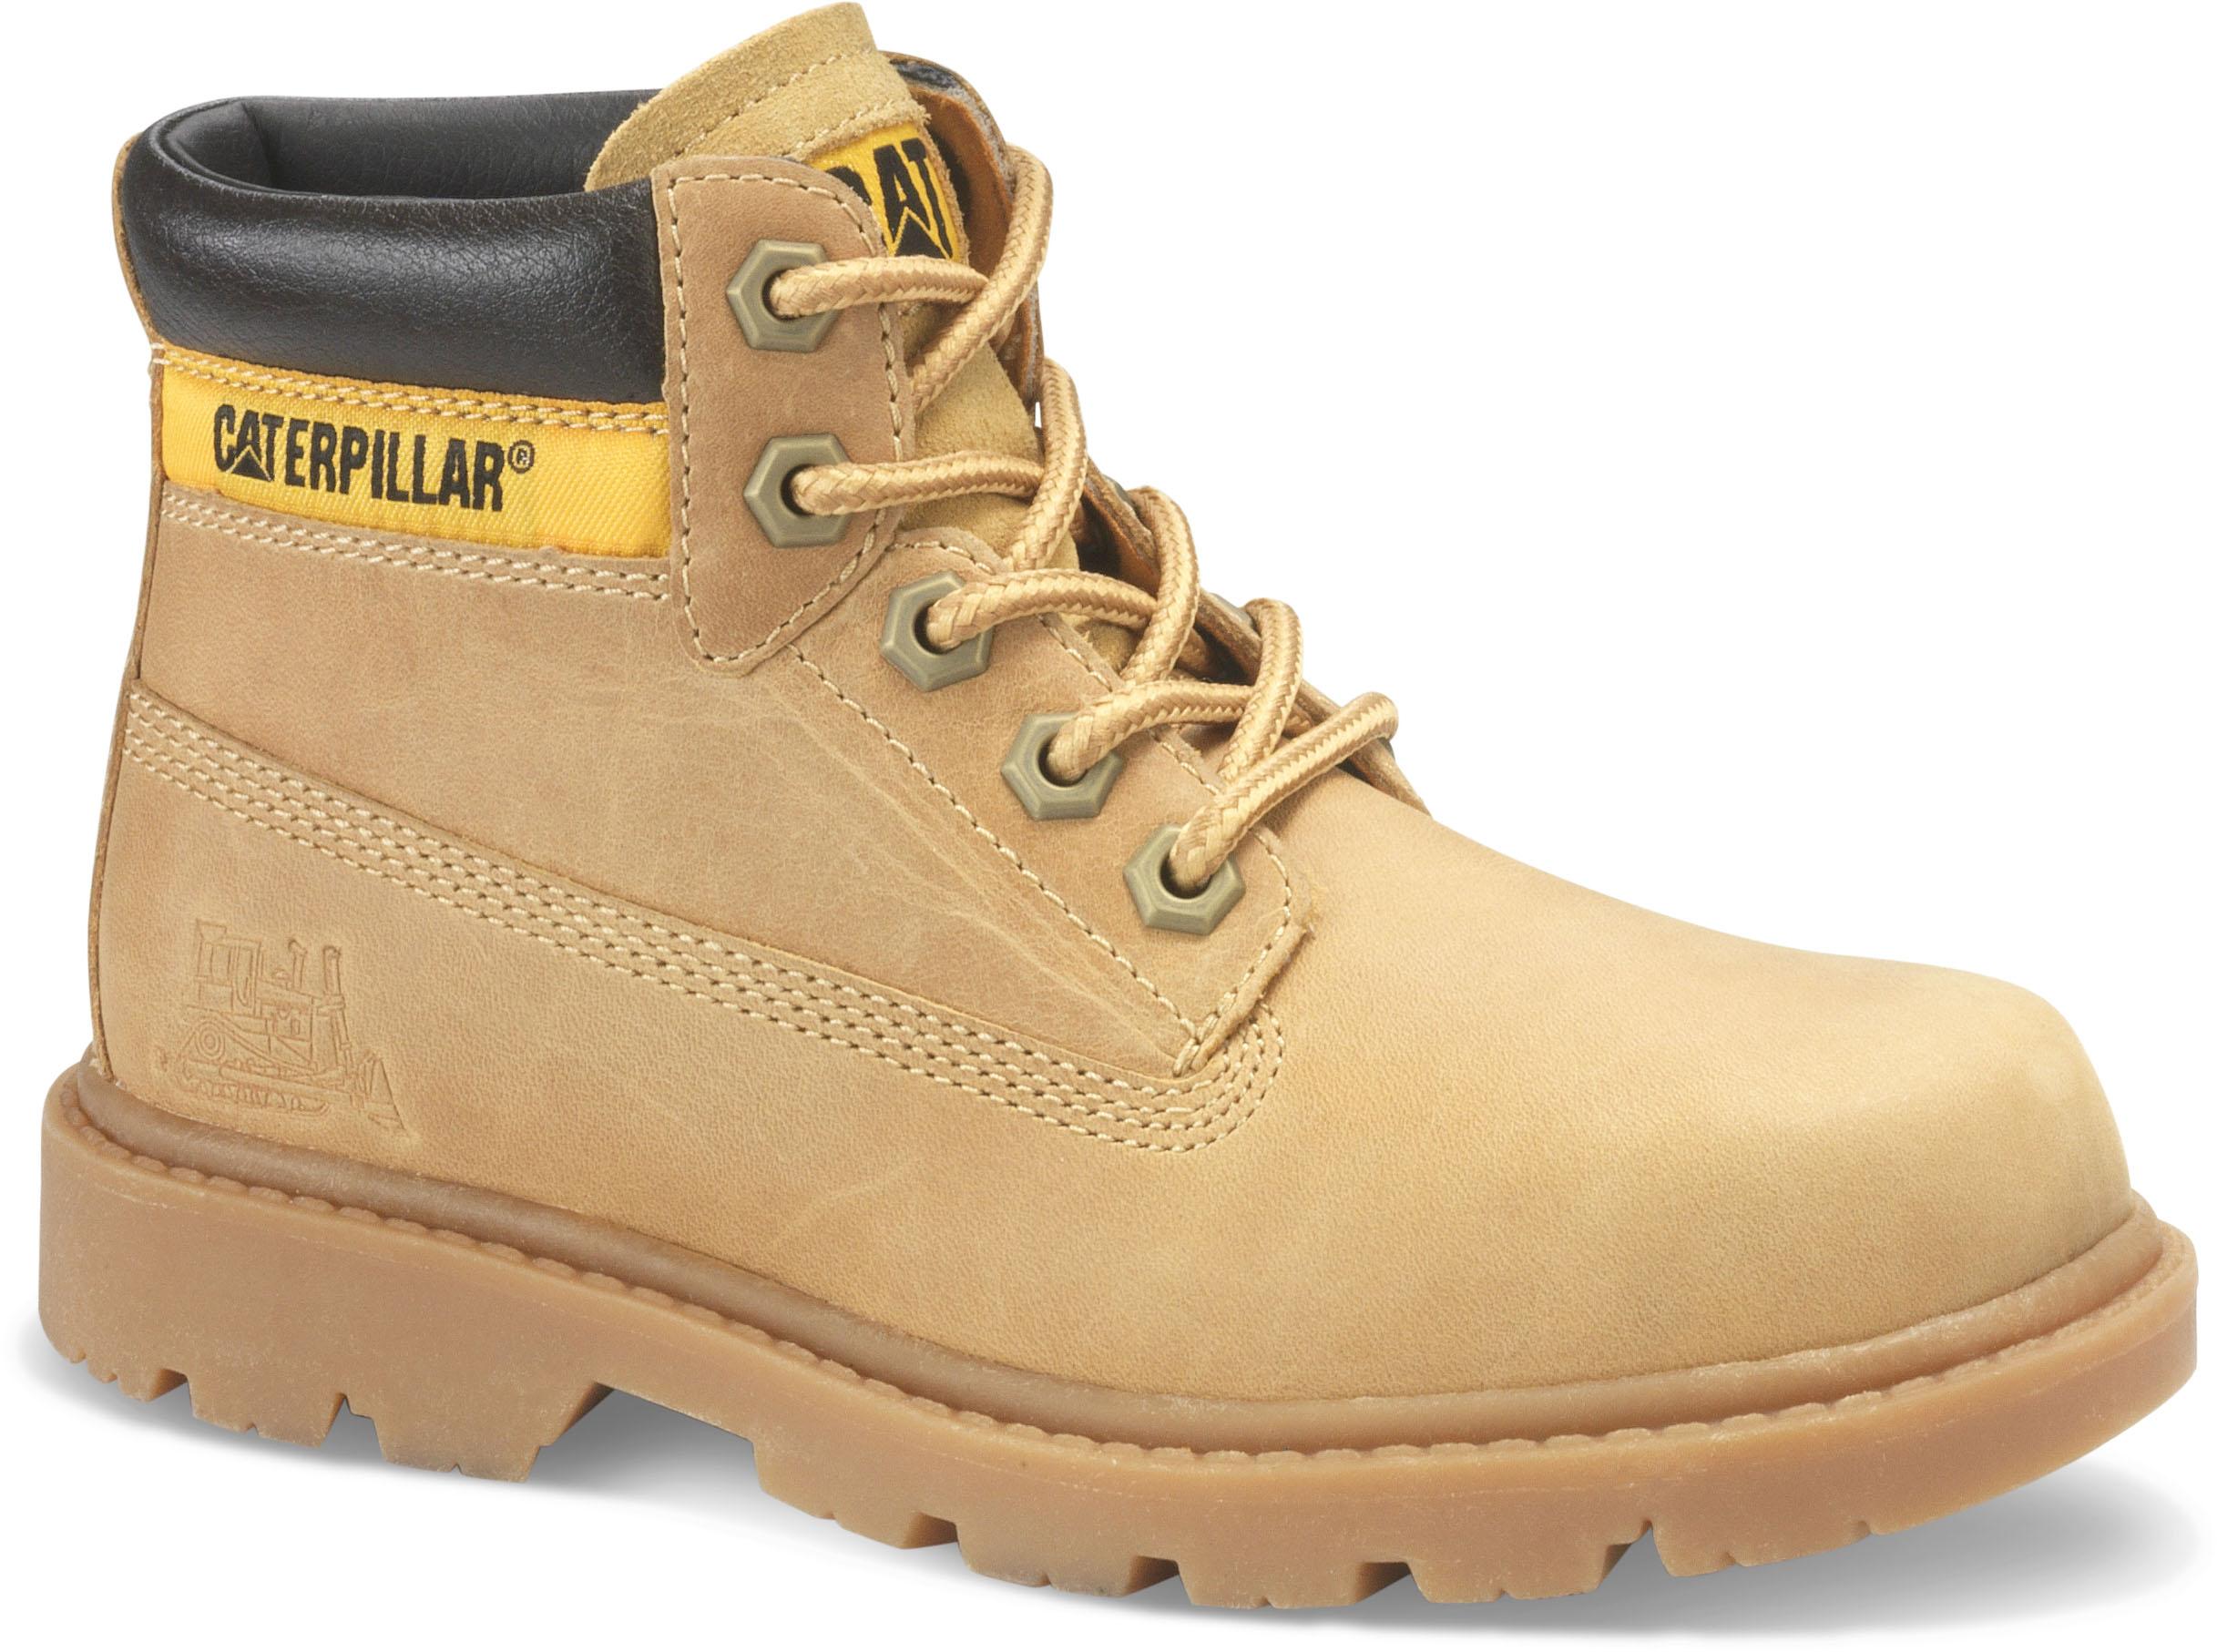 Ботинки Caterpillar Colorado Plus цена